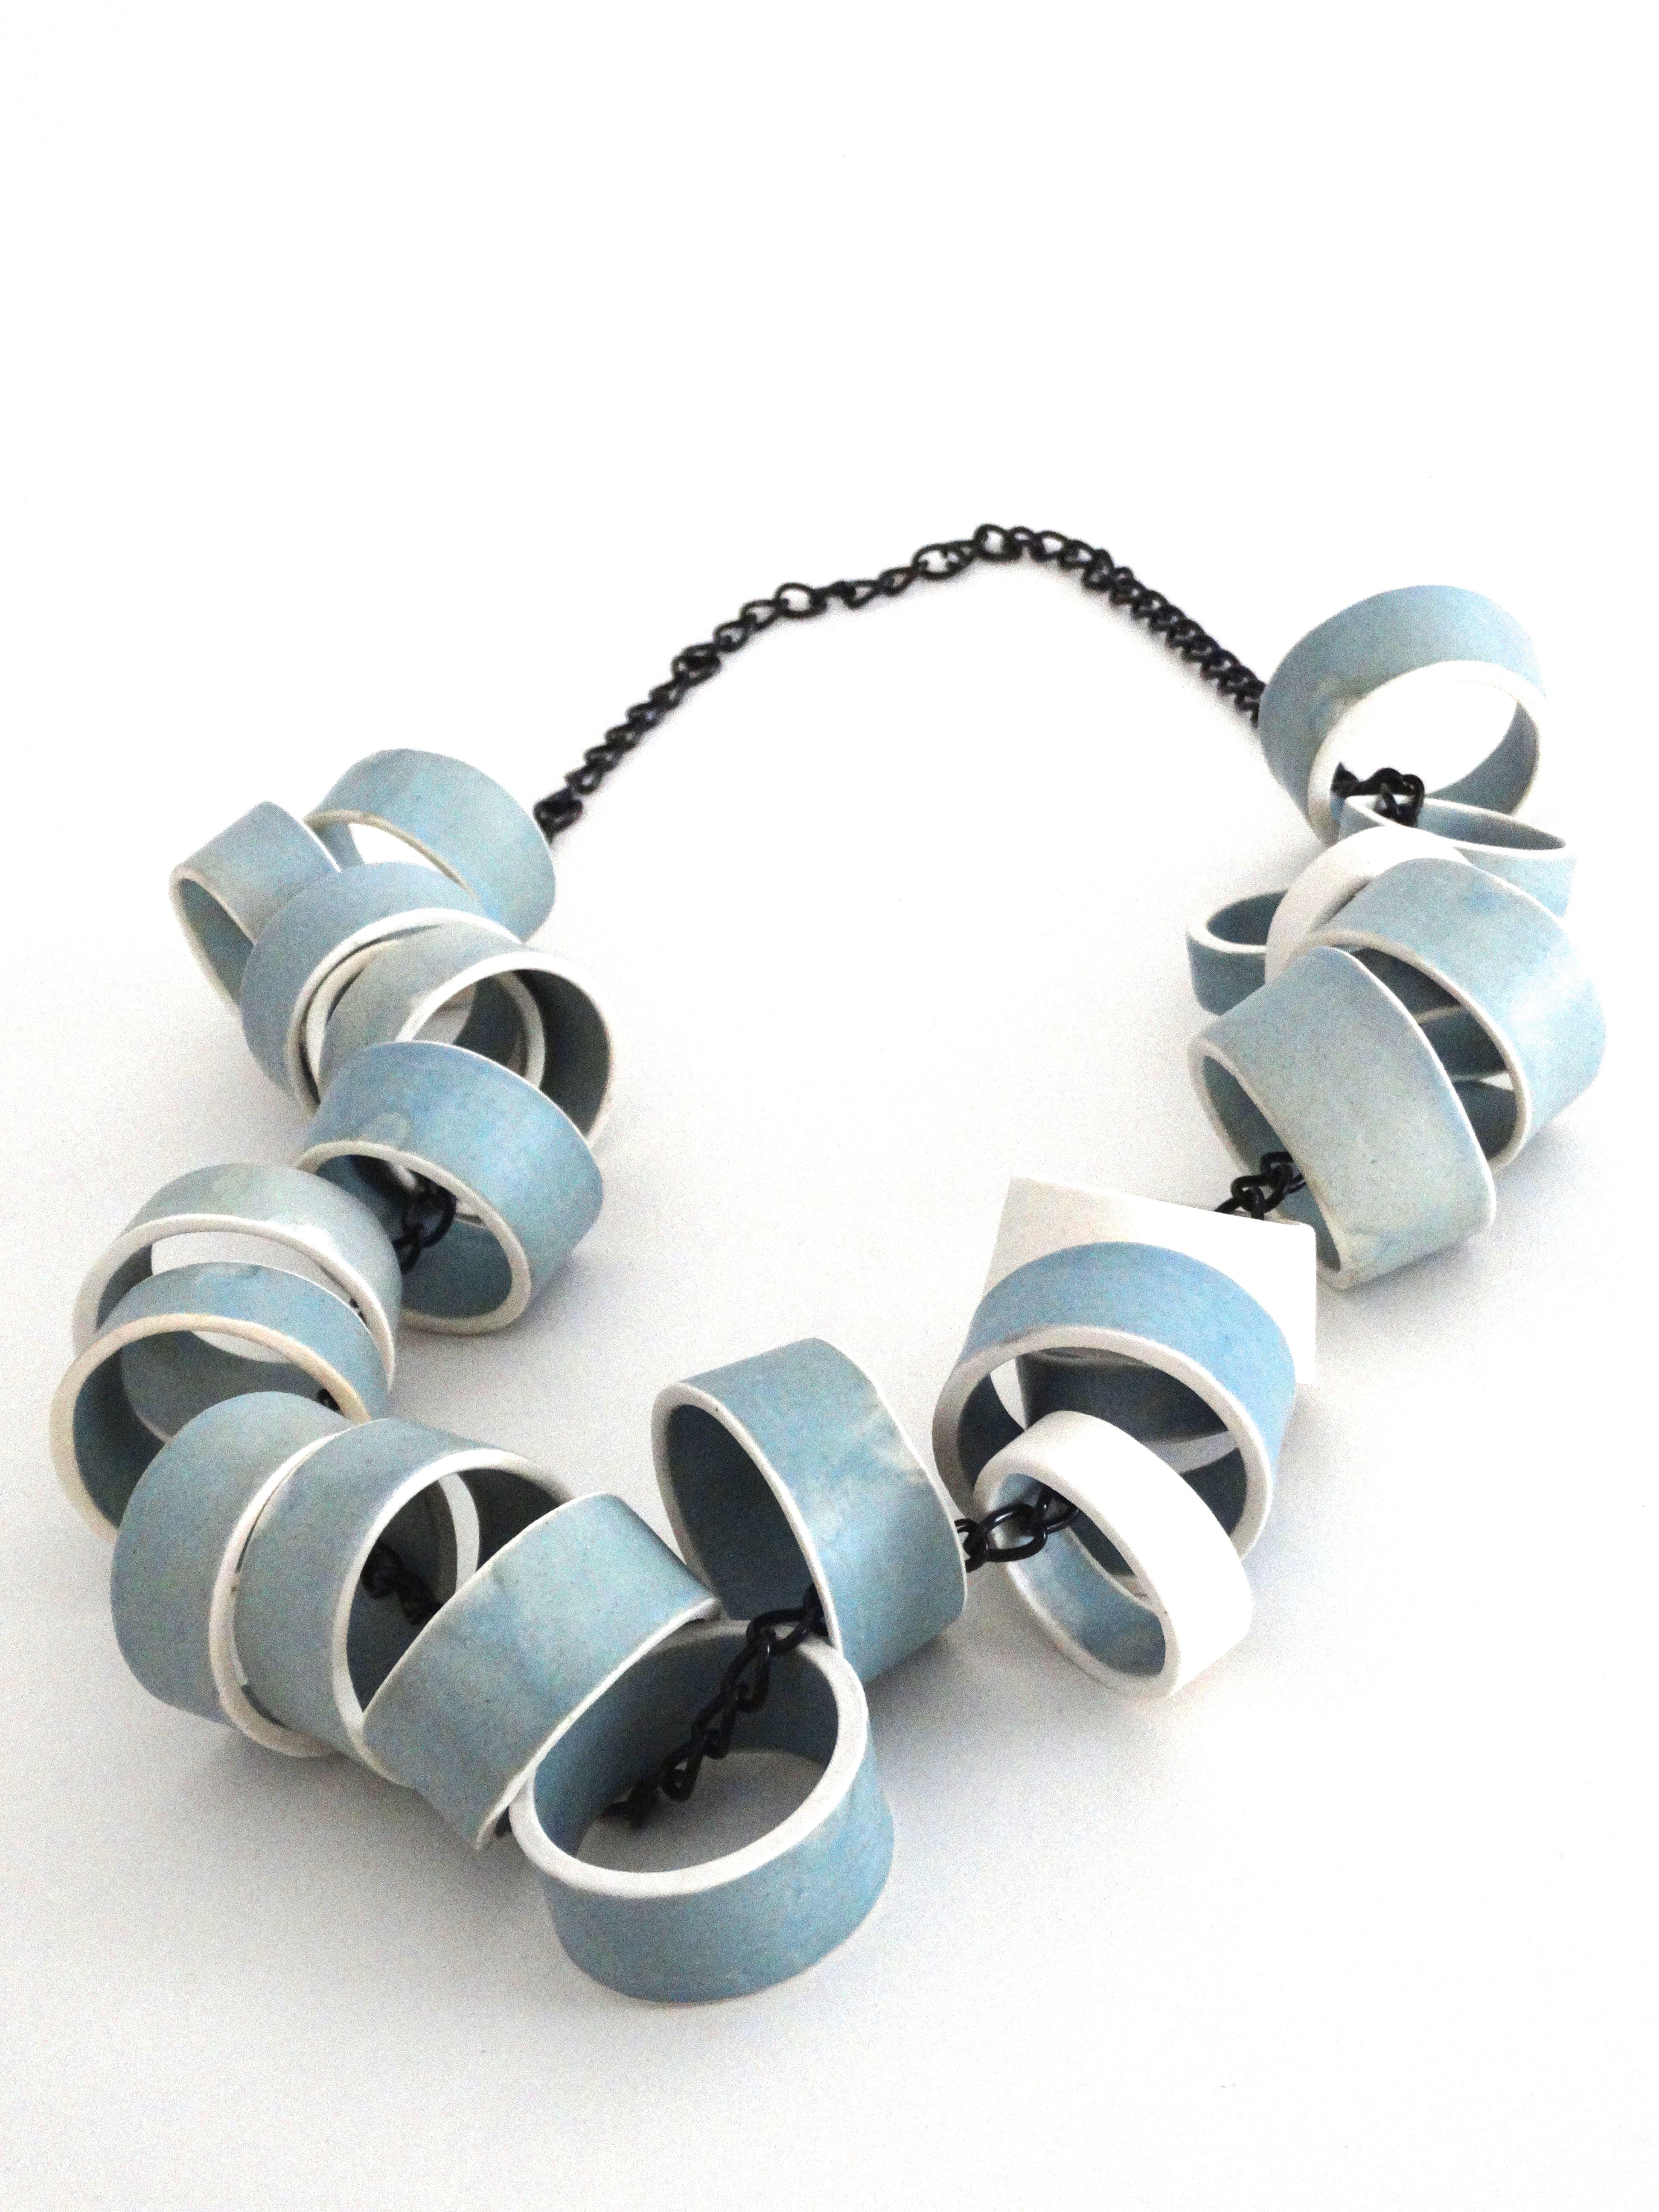 Chain. Cristina Celis. Glazed Stoneware.